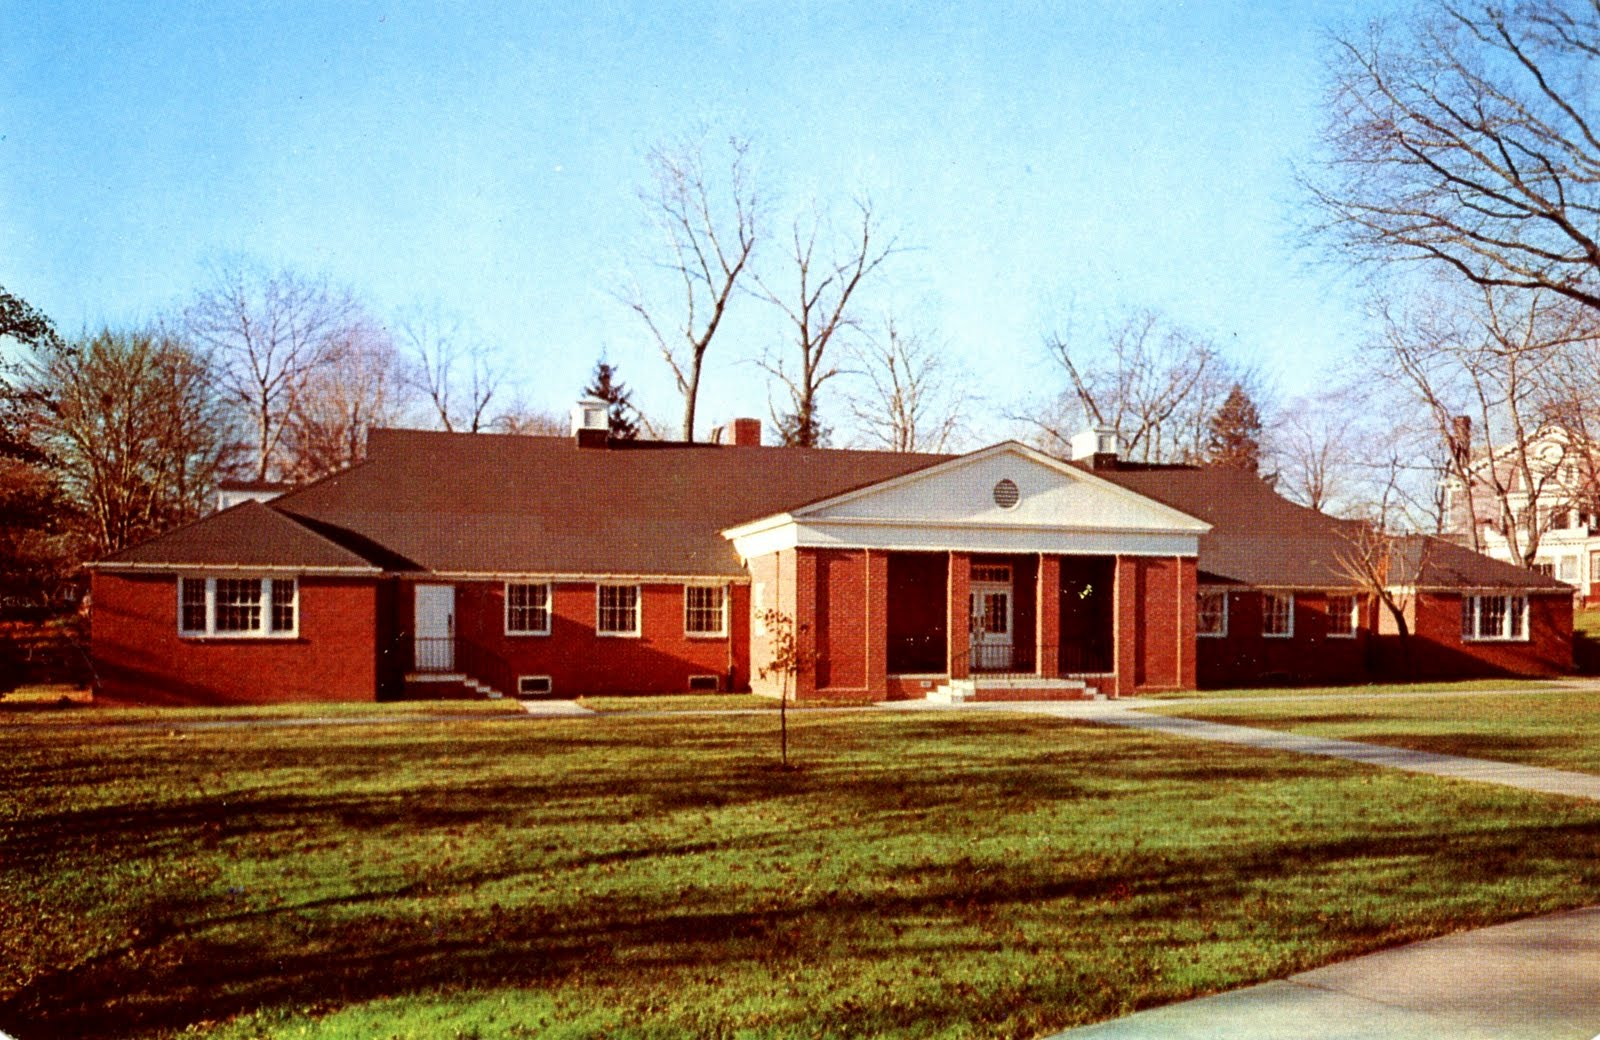 ... : Library, Fairleigh Dickinson University, Teaneck, New Jersey: http://librarypostcards.blogspot.com/2011/11/library-fairleigh-dickinson-university.html